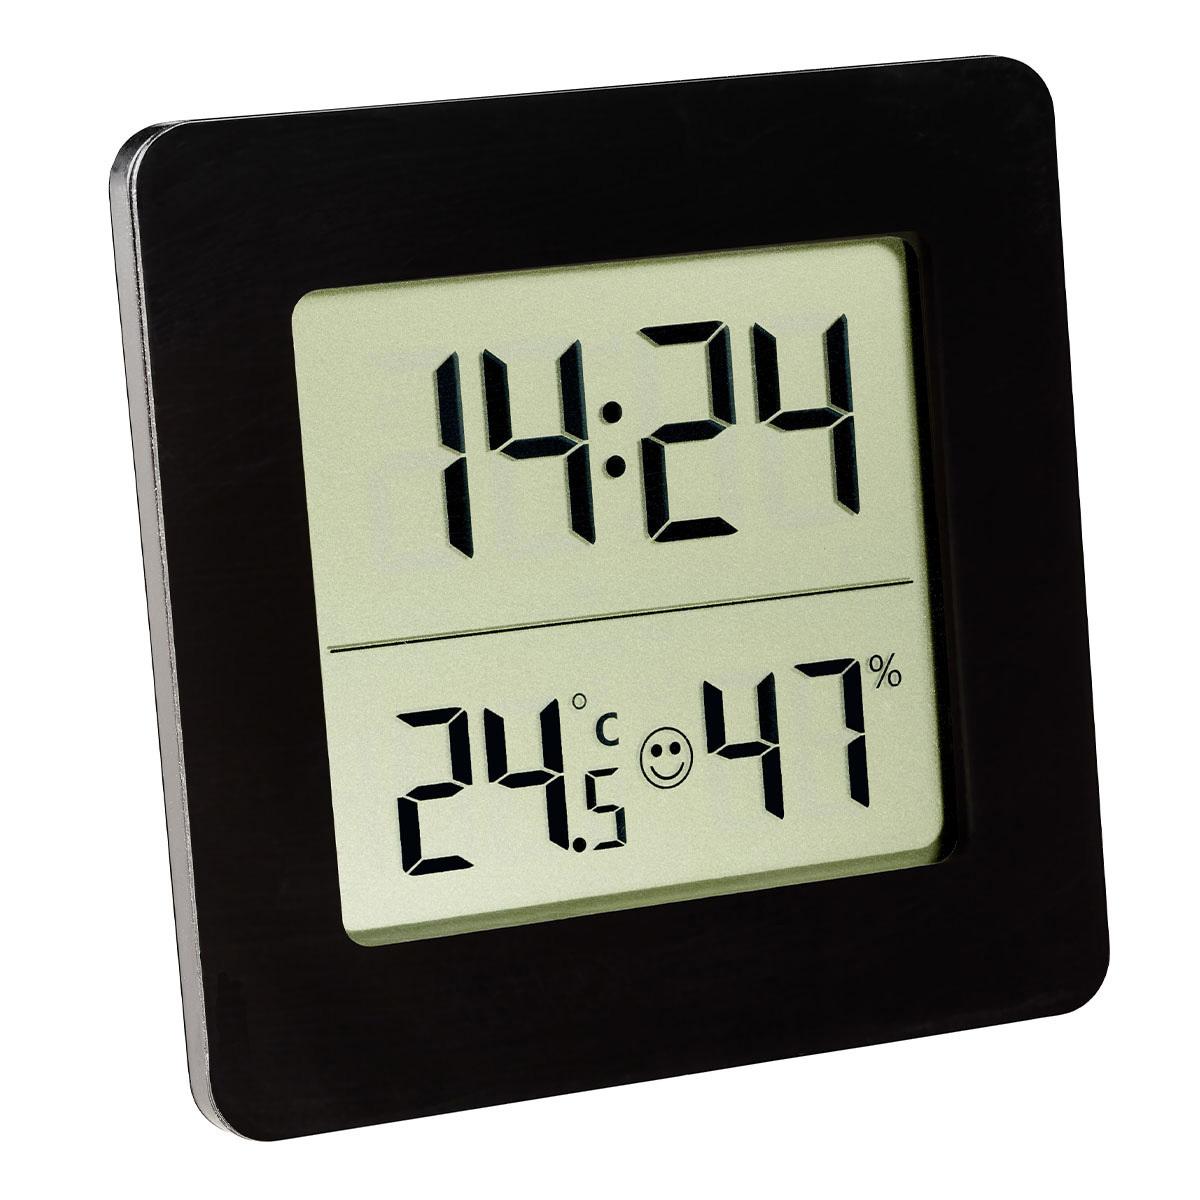 30-5038-01-digitales-thermo-hygrometer-ansicht-1200x1200px.jpg